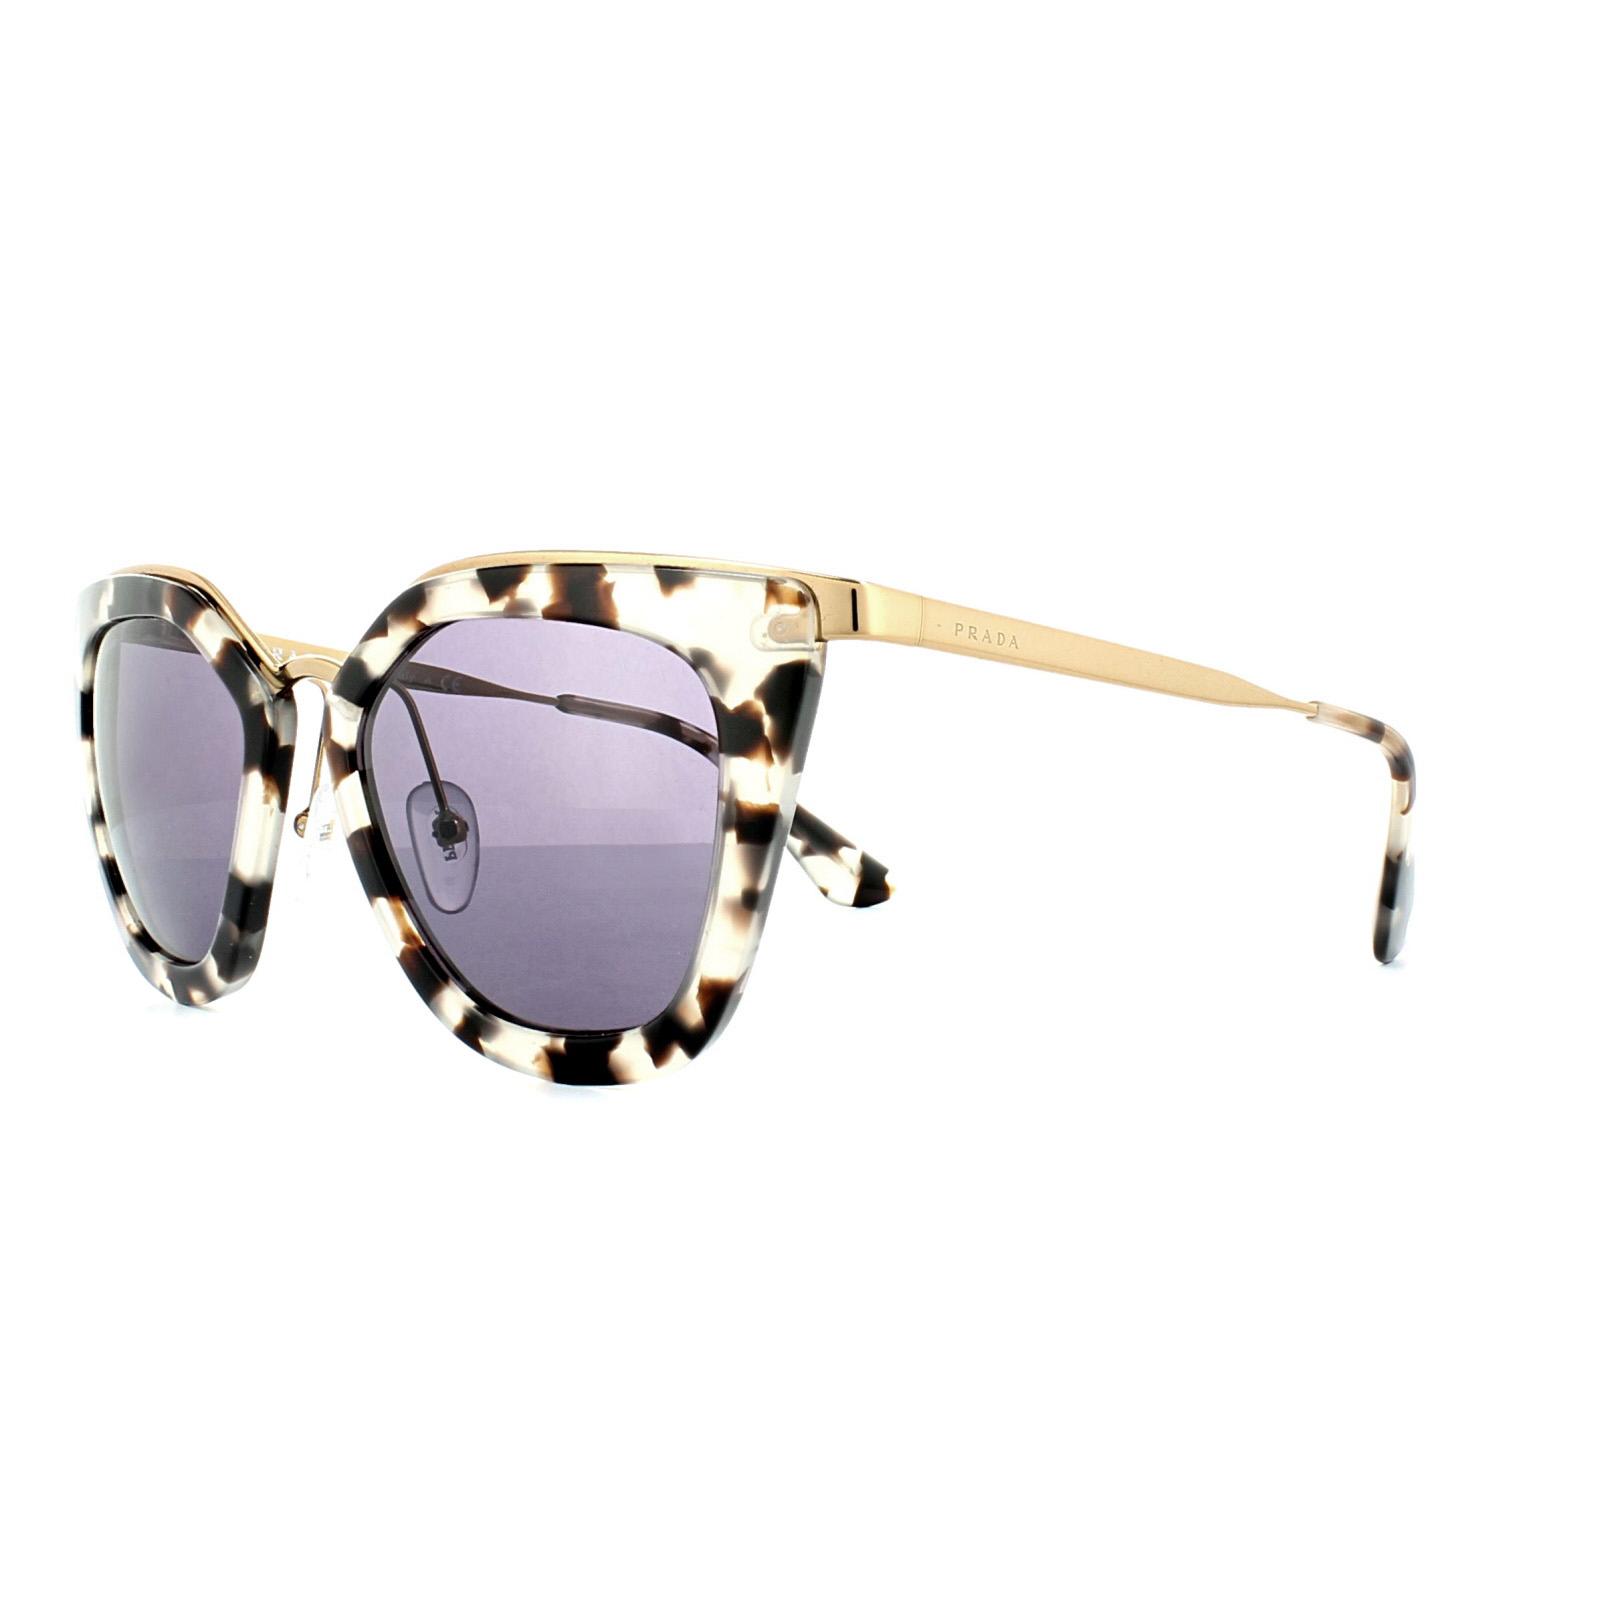 68cc84ab9fb ... netherlands sentinel prada sunglasses cinema evolution 53ss uao6o2  white havana violet 1651c 54d3d ...